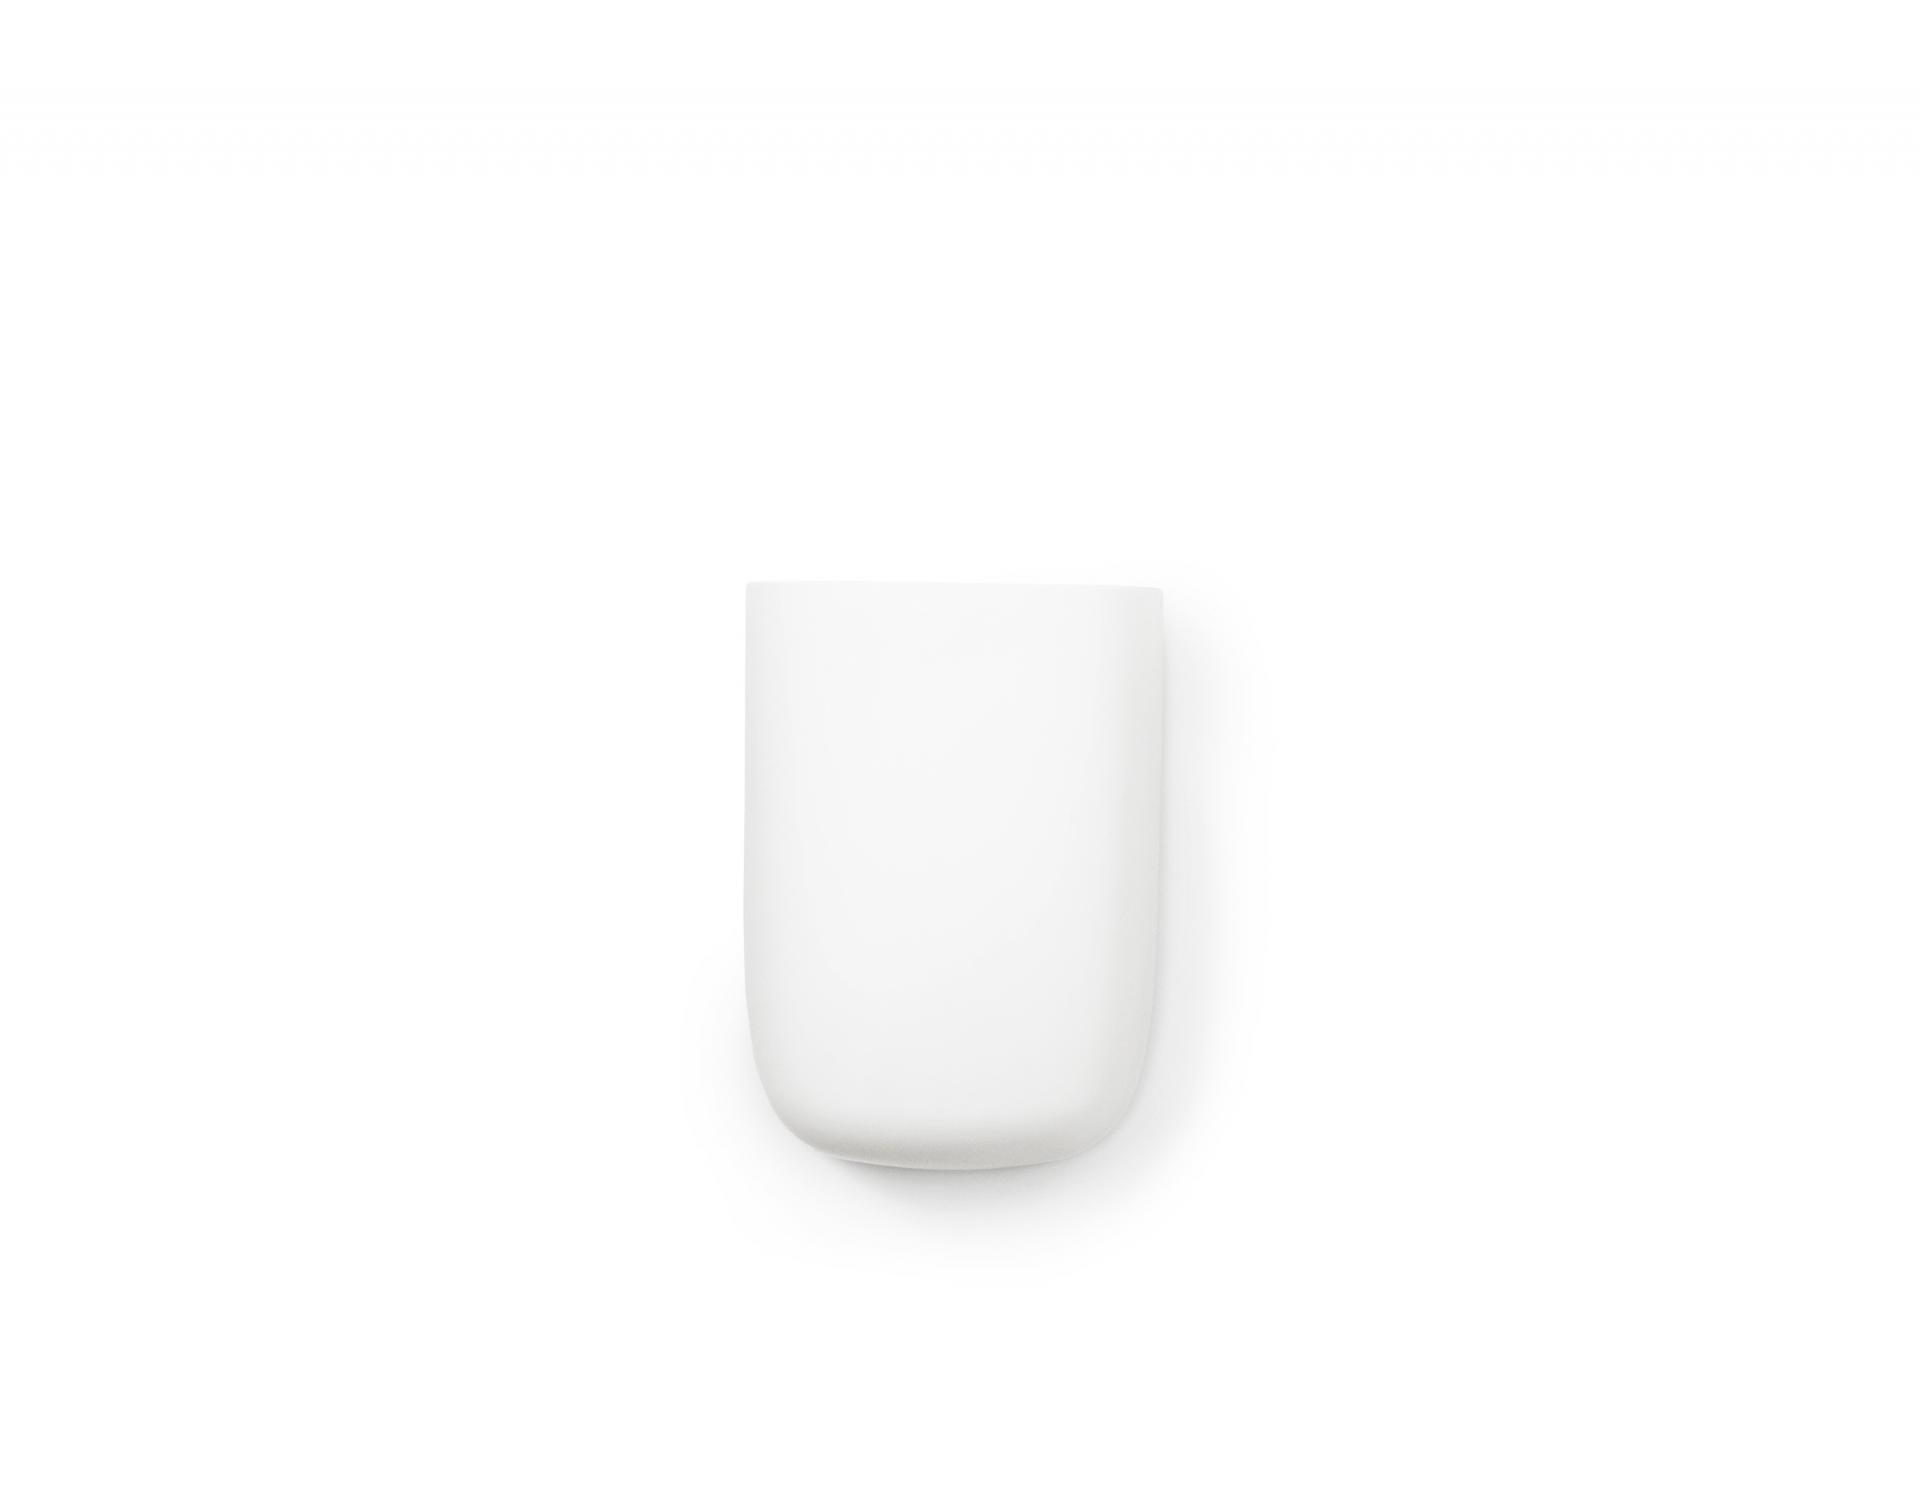 Normann Copenhagen Nástěnný organizér White Pocket 3, bílá barva, plast